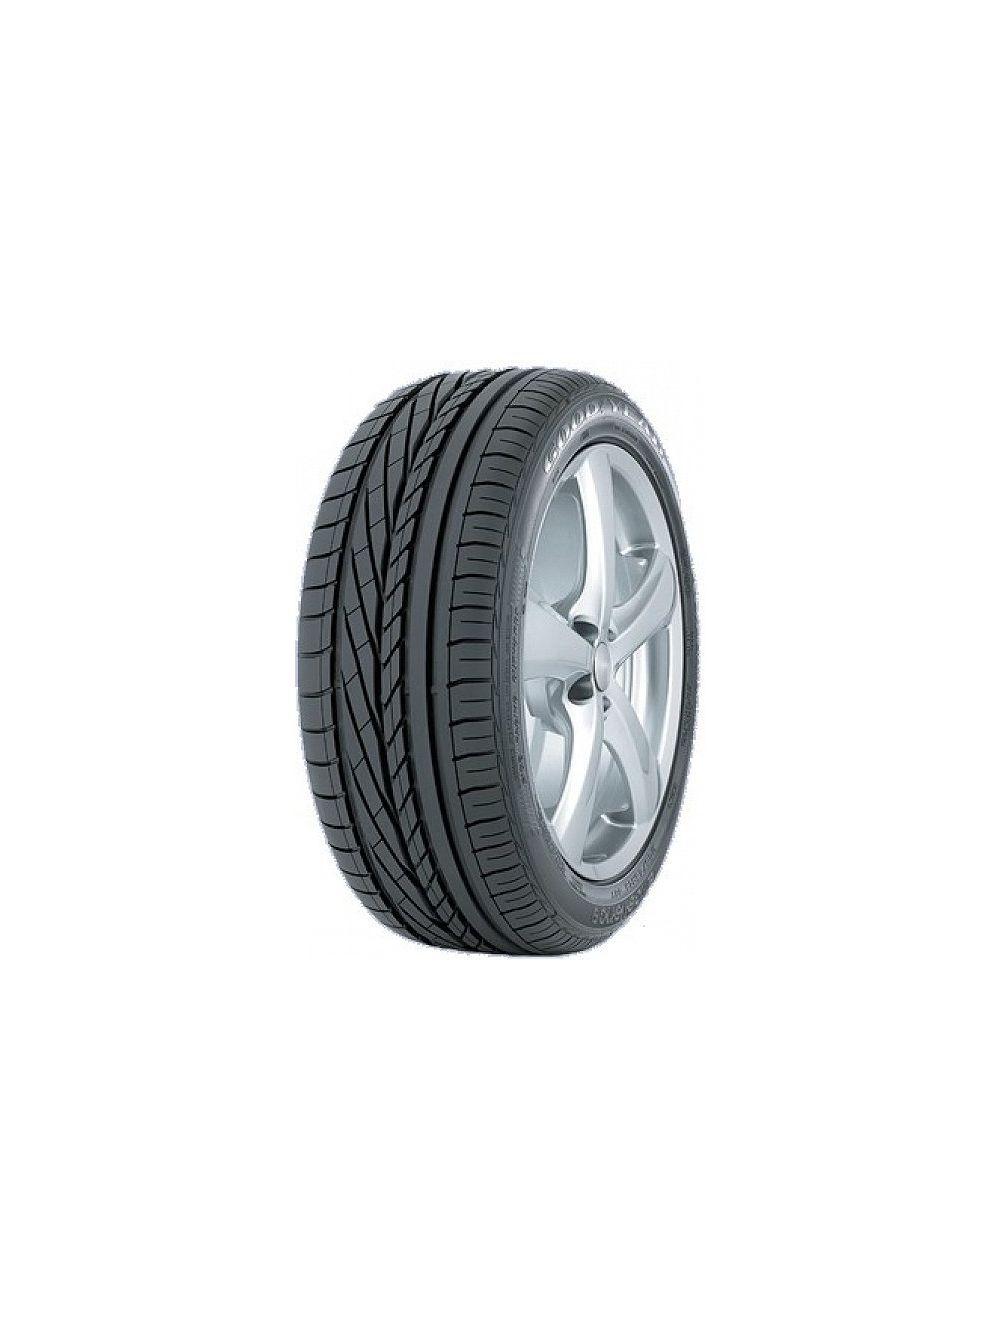 Goodyear 225/45R17 W Excellence ROF MOE FP Nyári gumi